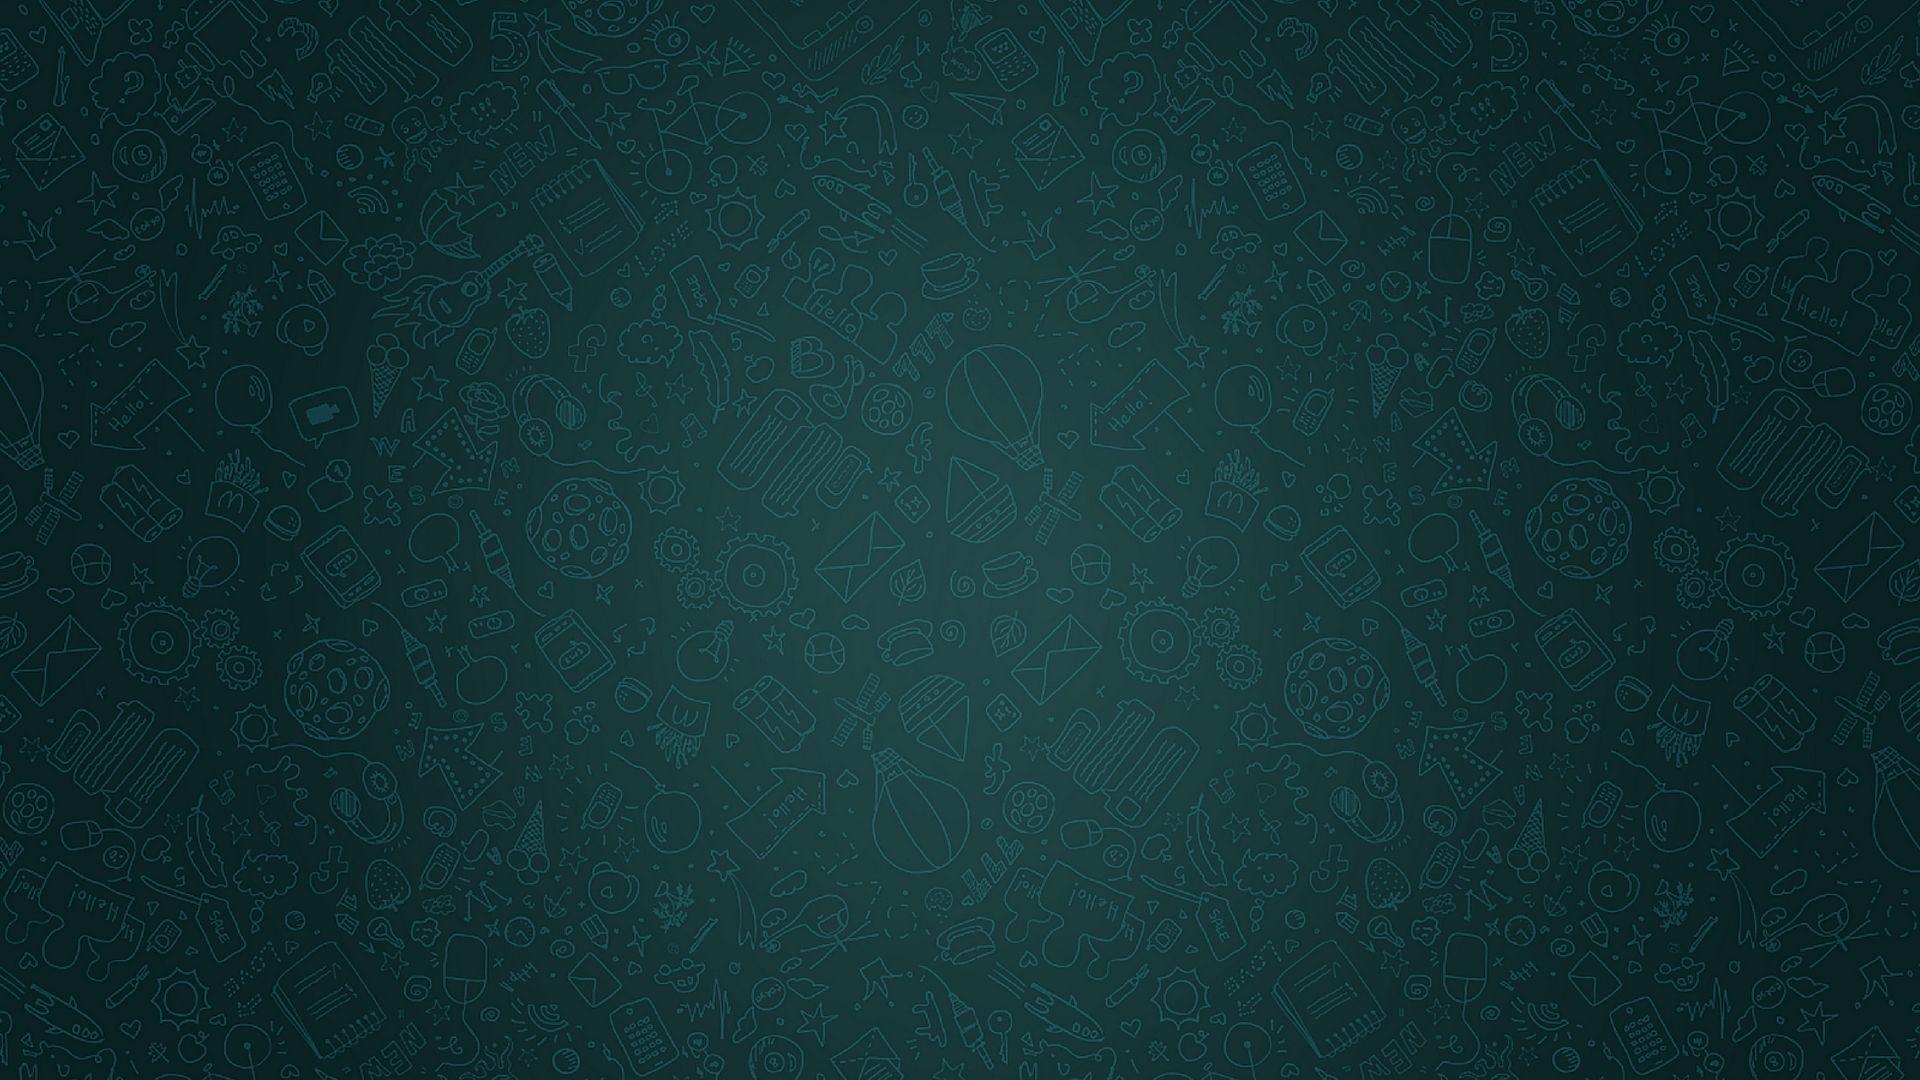 Originalhd Whatsapp Background Wallpapers - Wallpaper , HD Wallpaper & Backgrounds